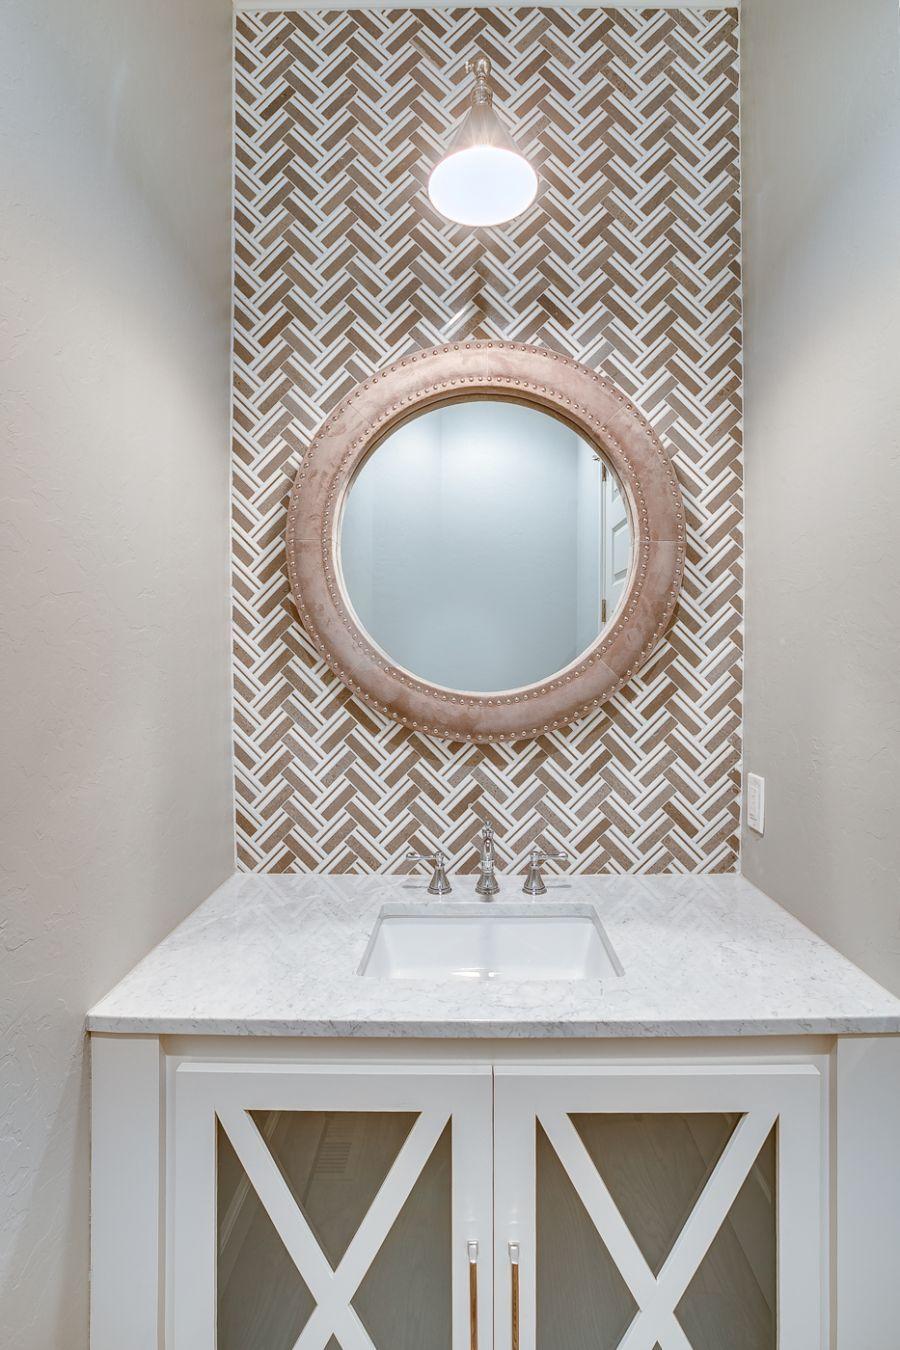 Powder room with gorgeous tile backsplash.